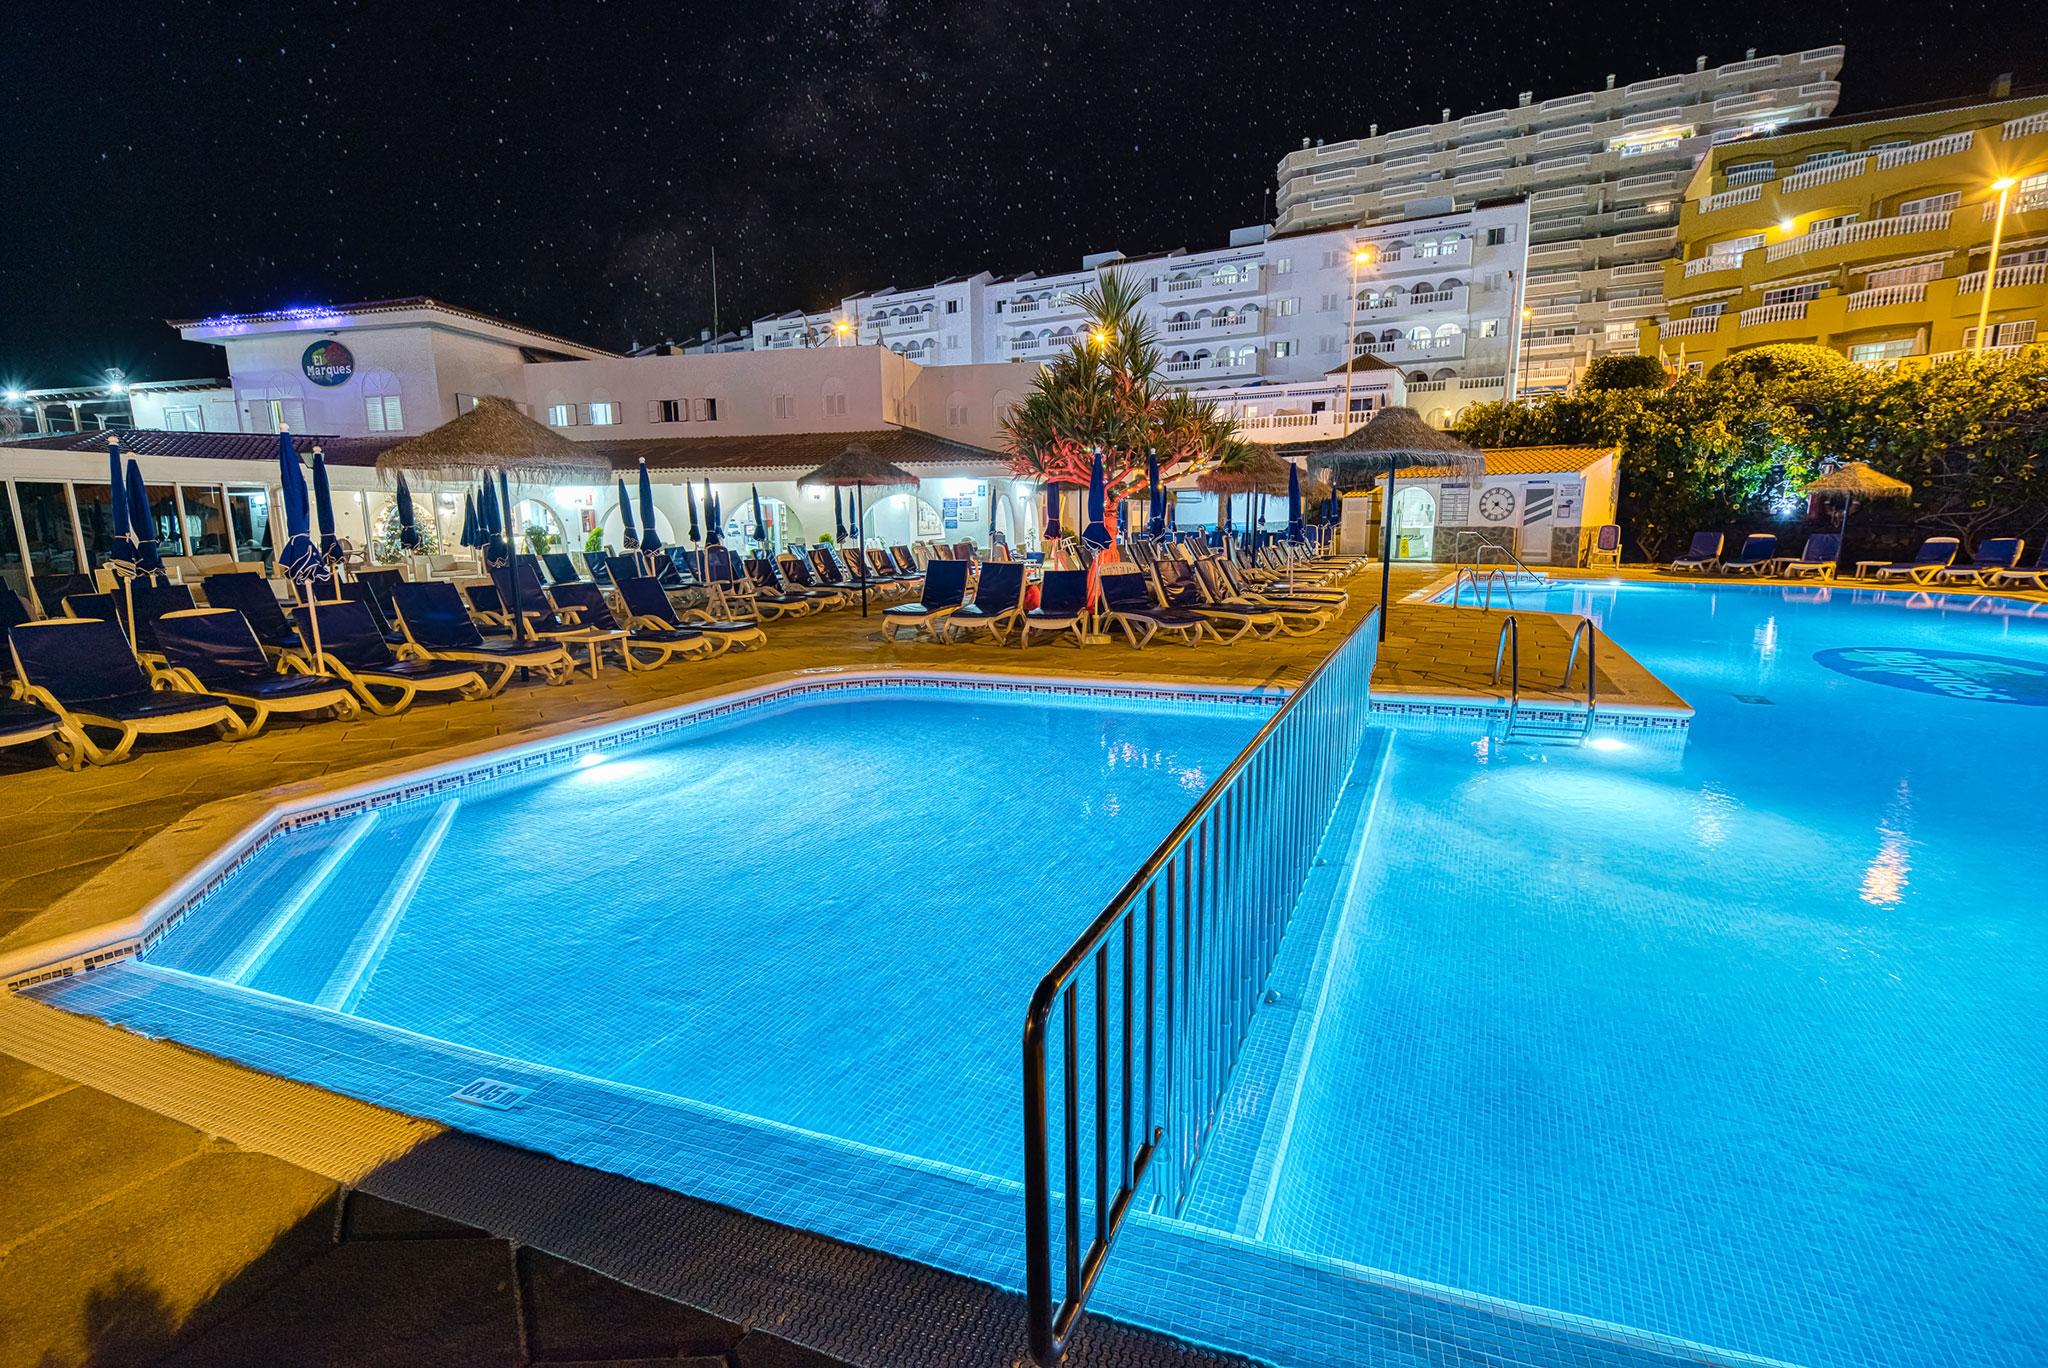 Hotel Marques Night pool